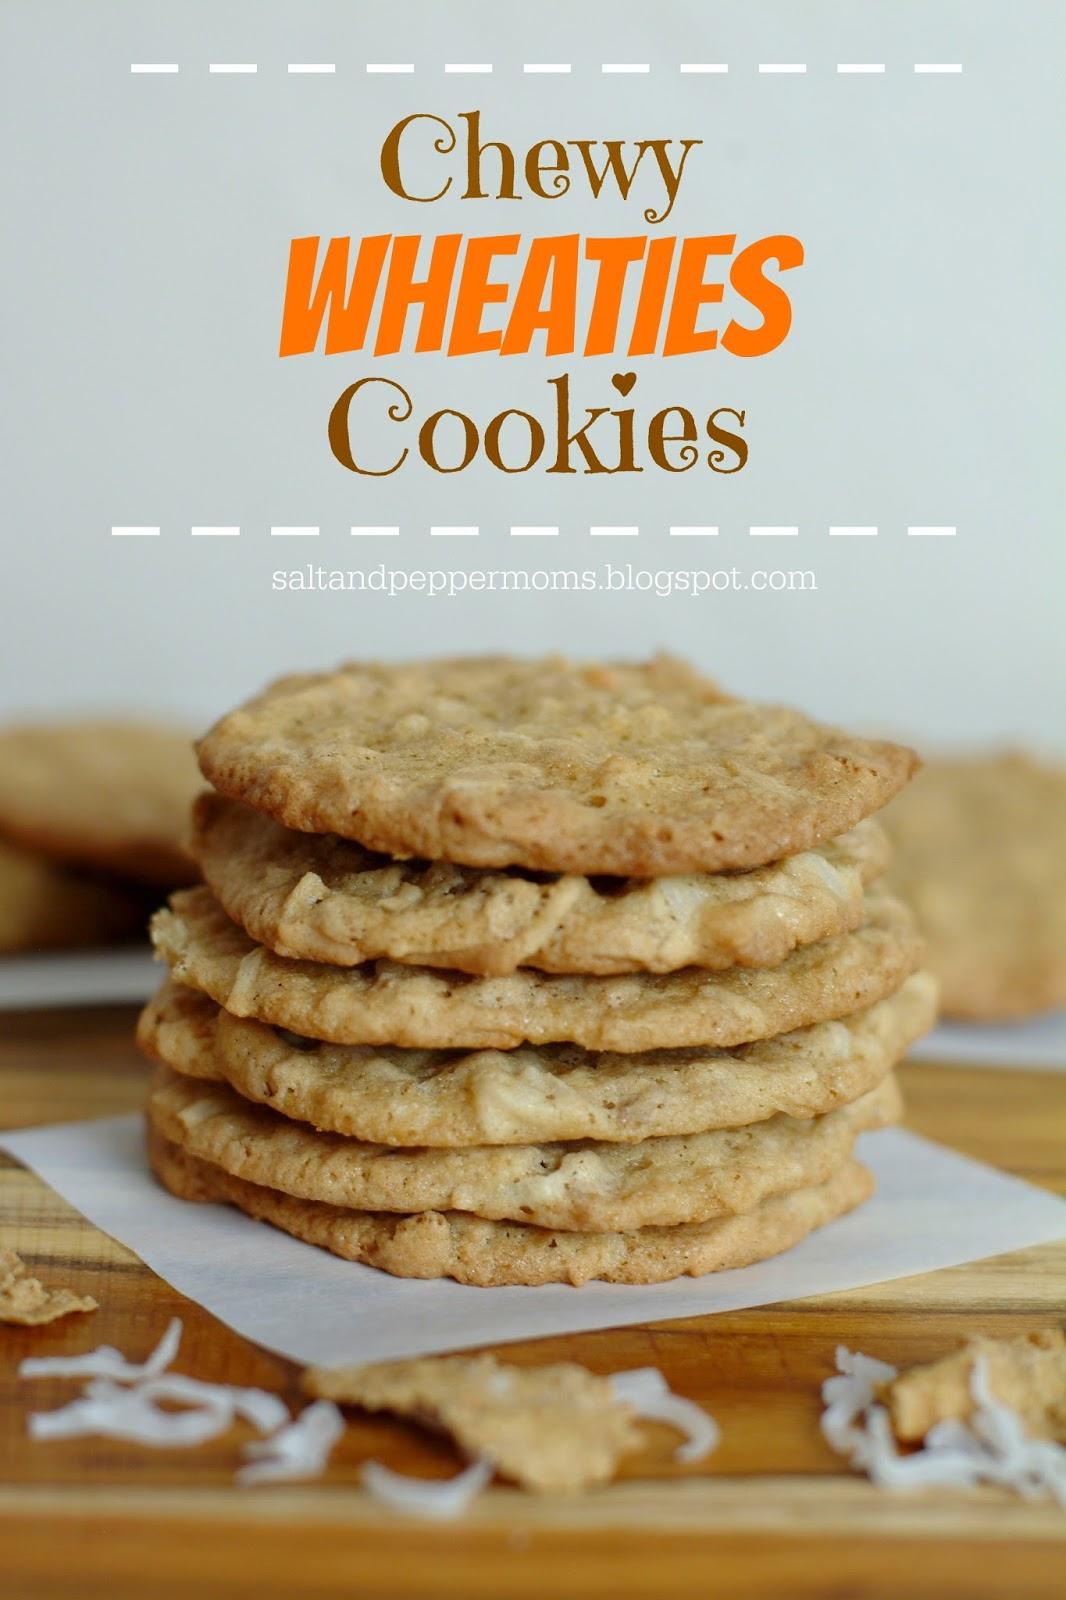 Salt and Pepper Moms: Chewy Wheaties Cookies